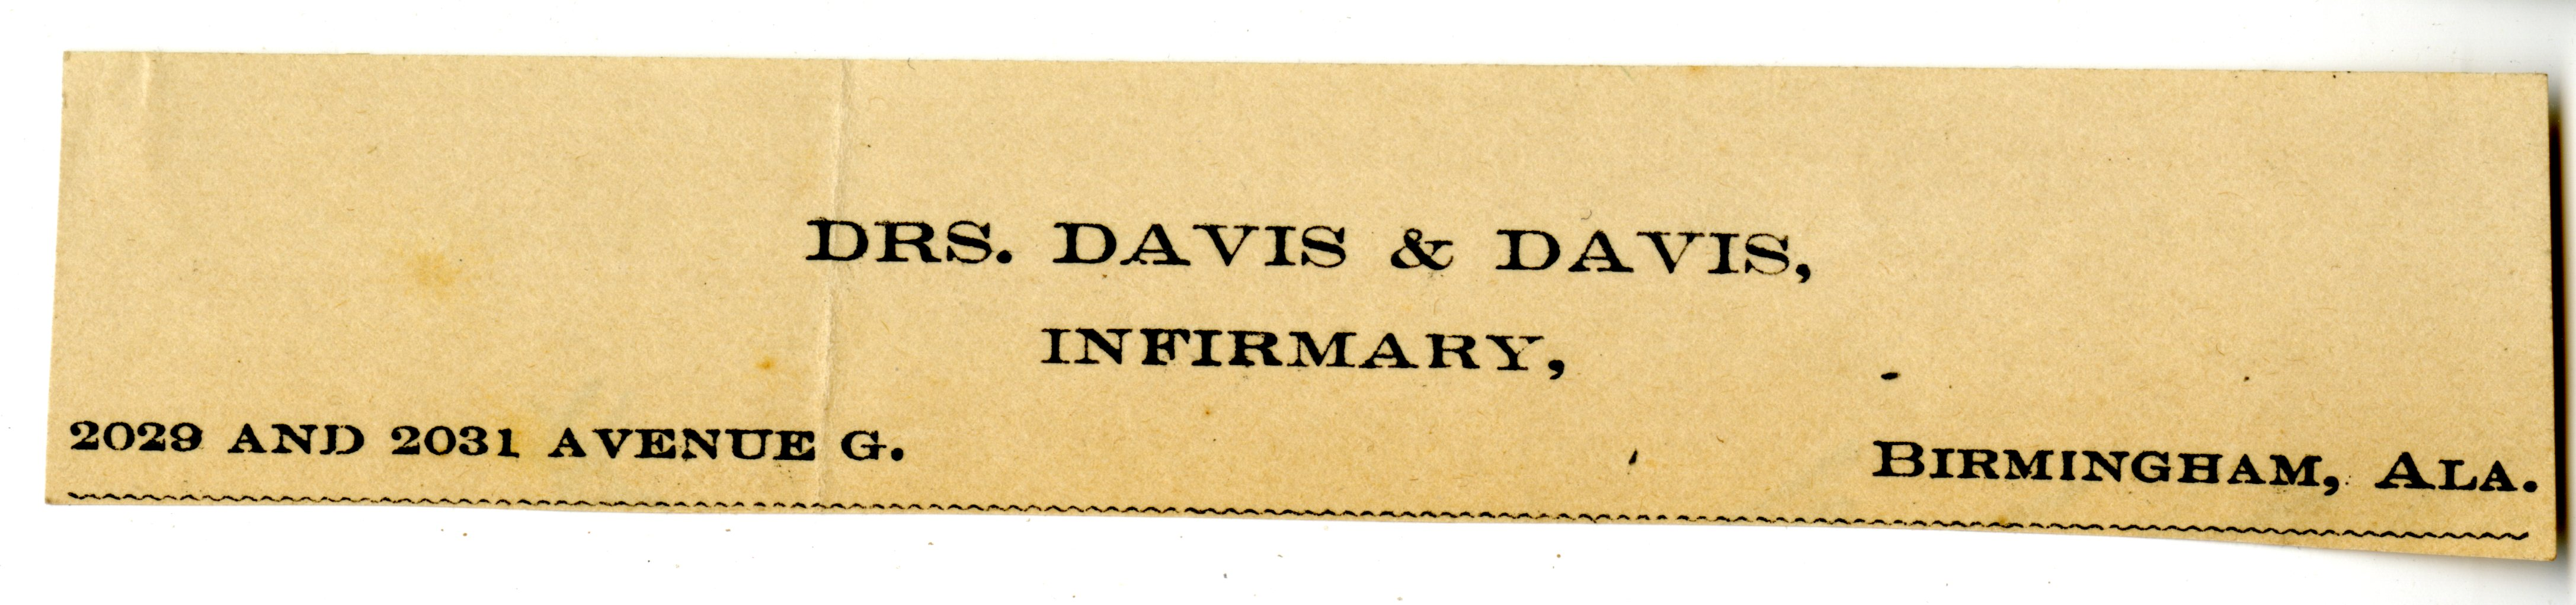 Davis & Davis Infirmary